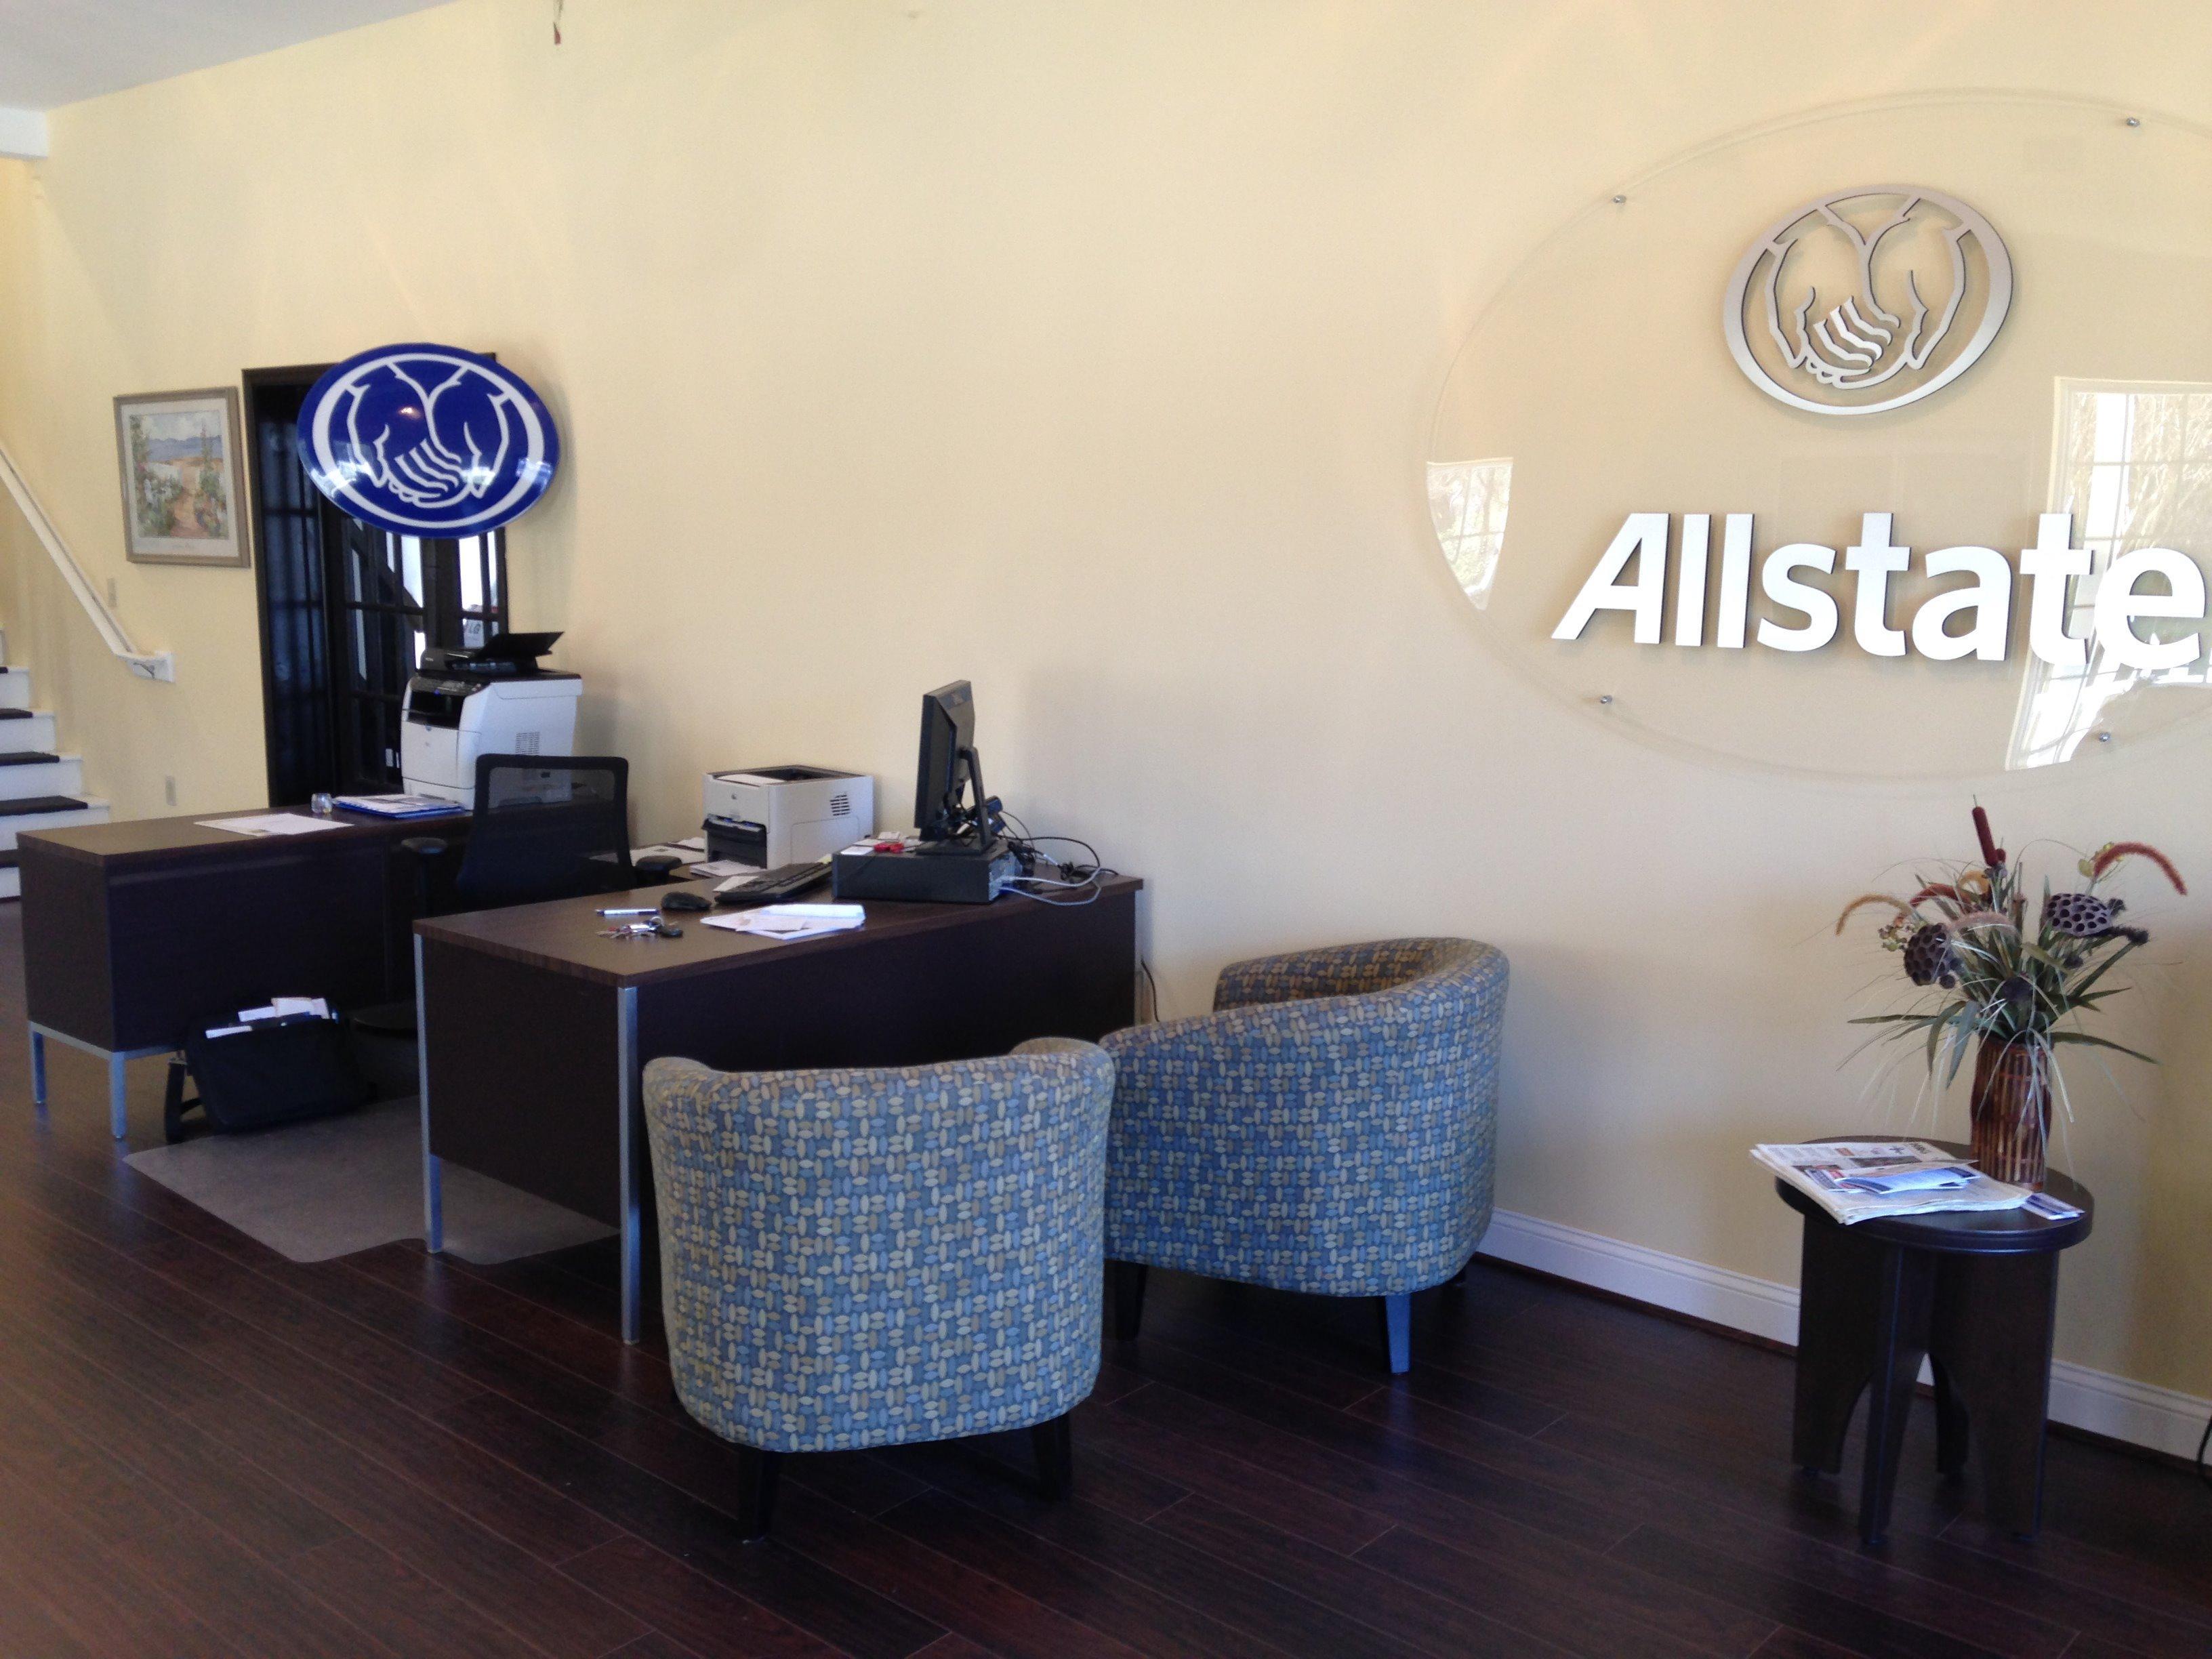 ralph m rios allstate insurance insurance agency virginia